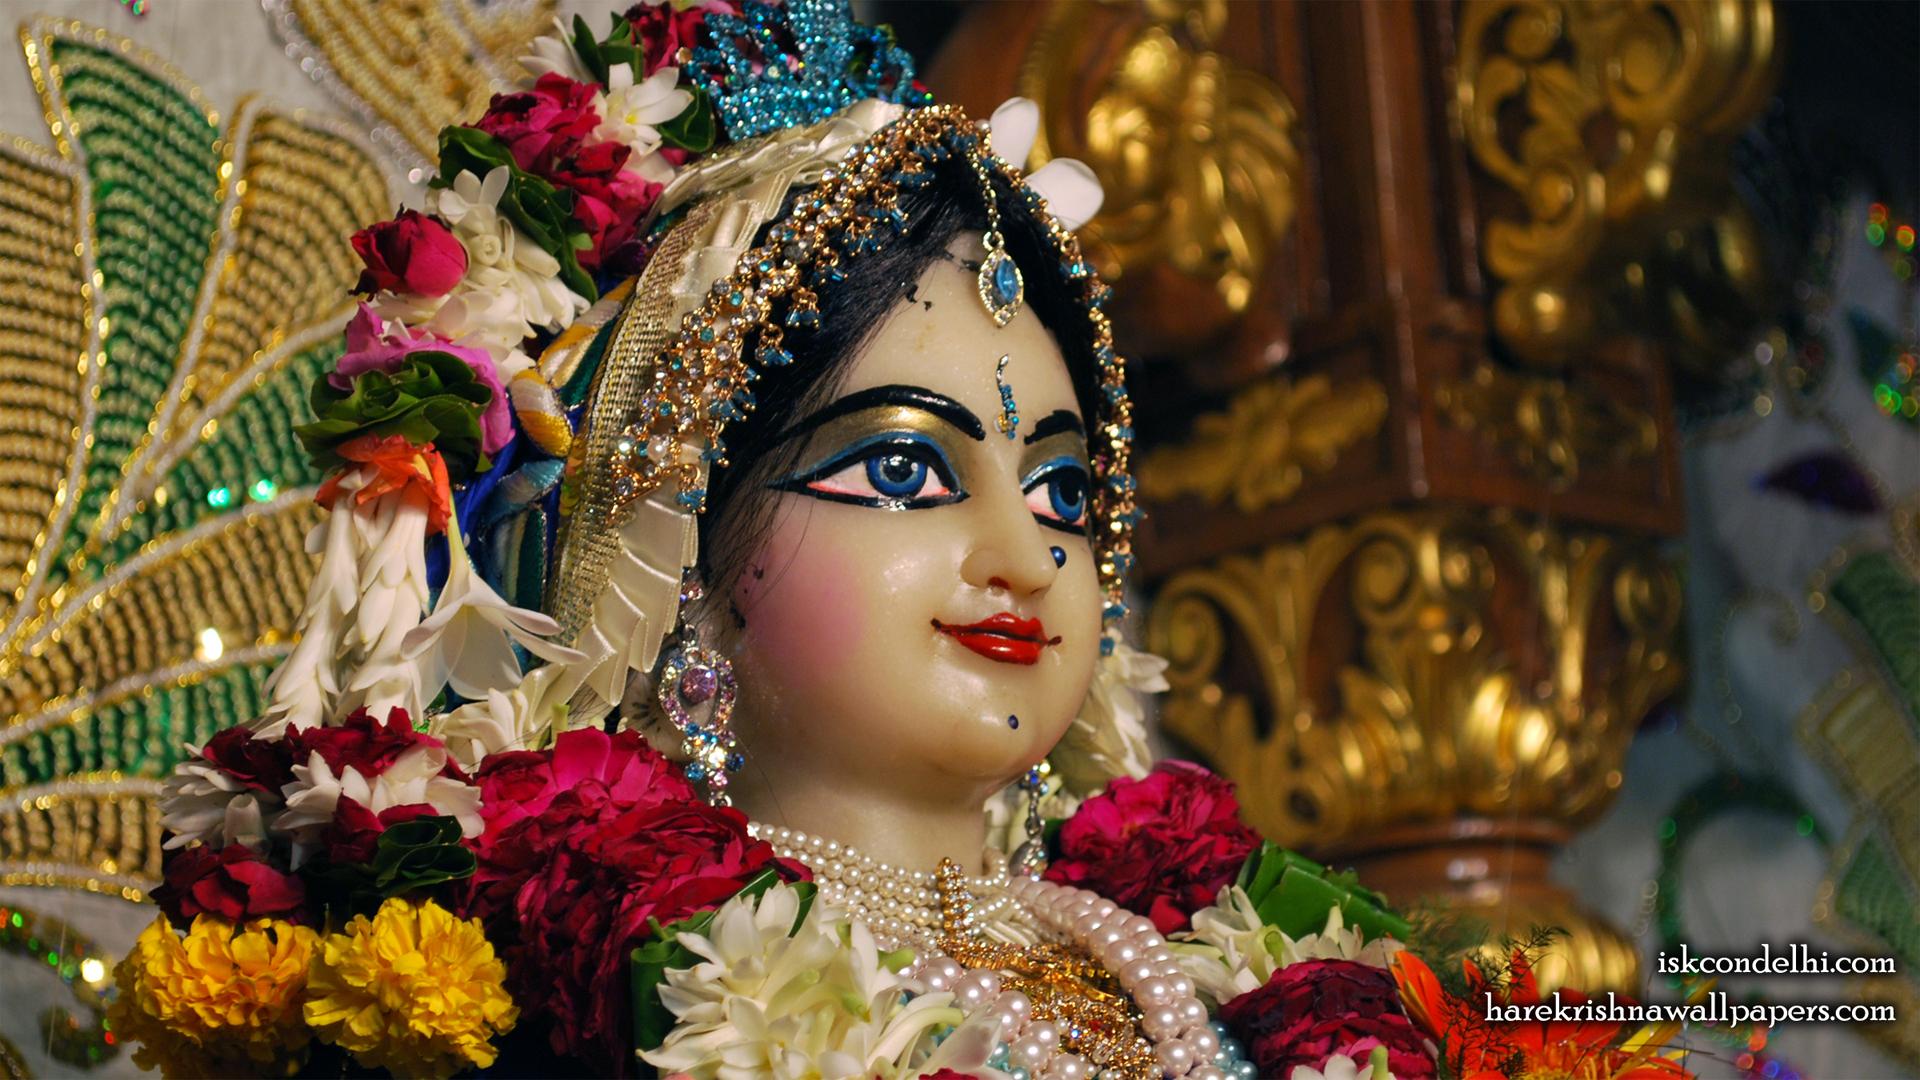 Sri Radha Close up Wallpaper (024) Size 1920x1080 Download